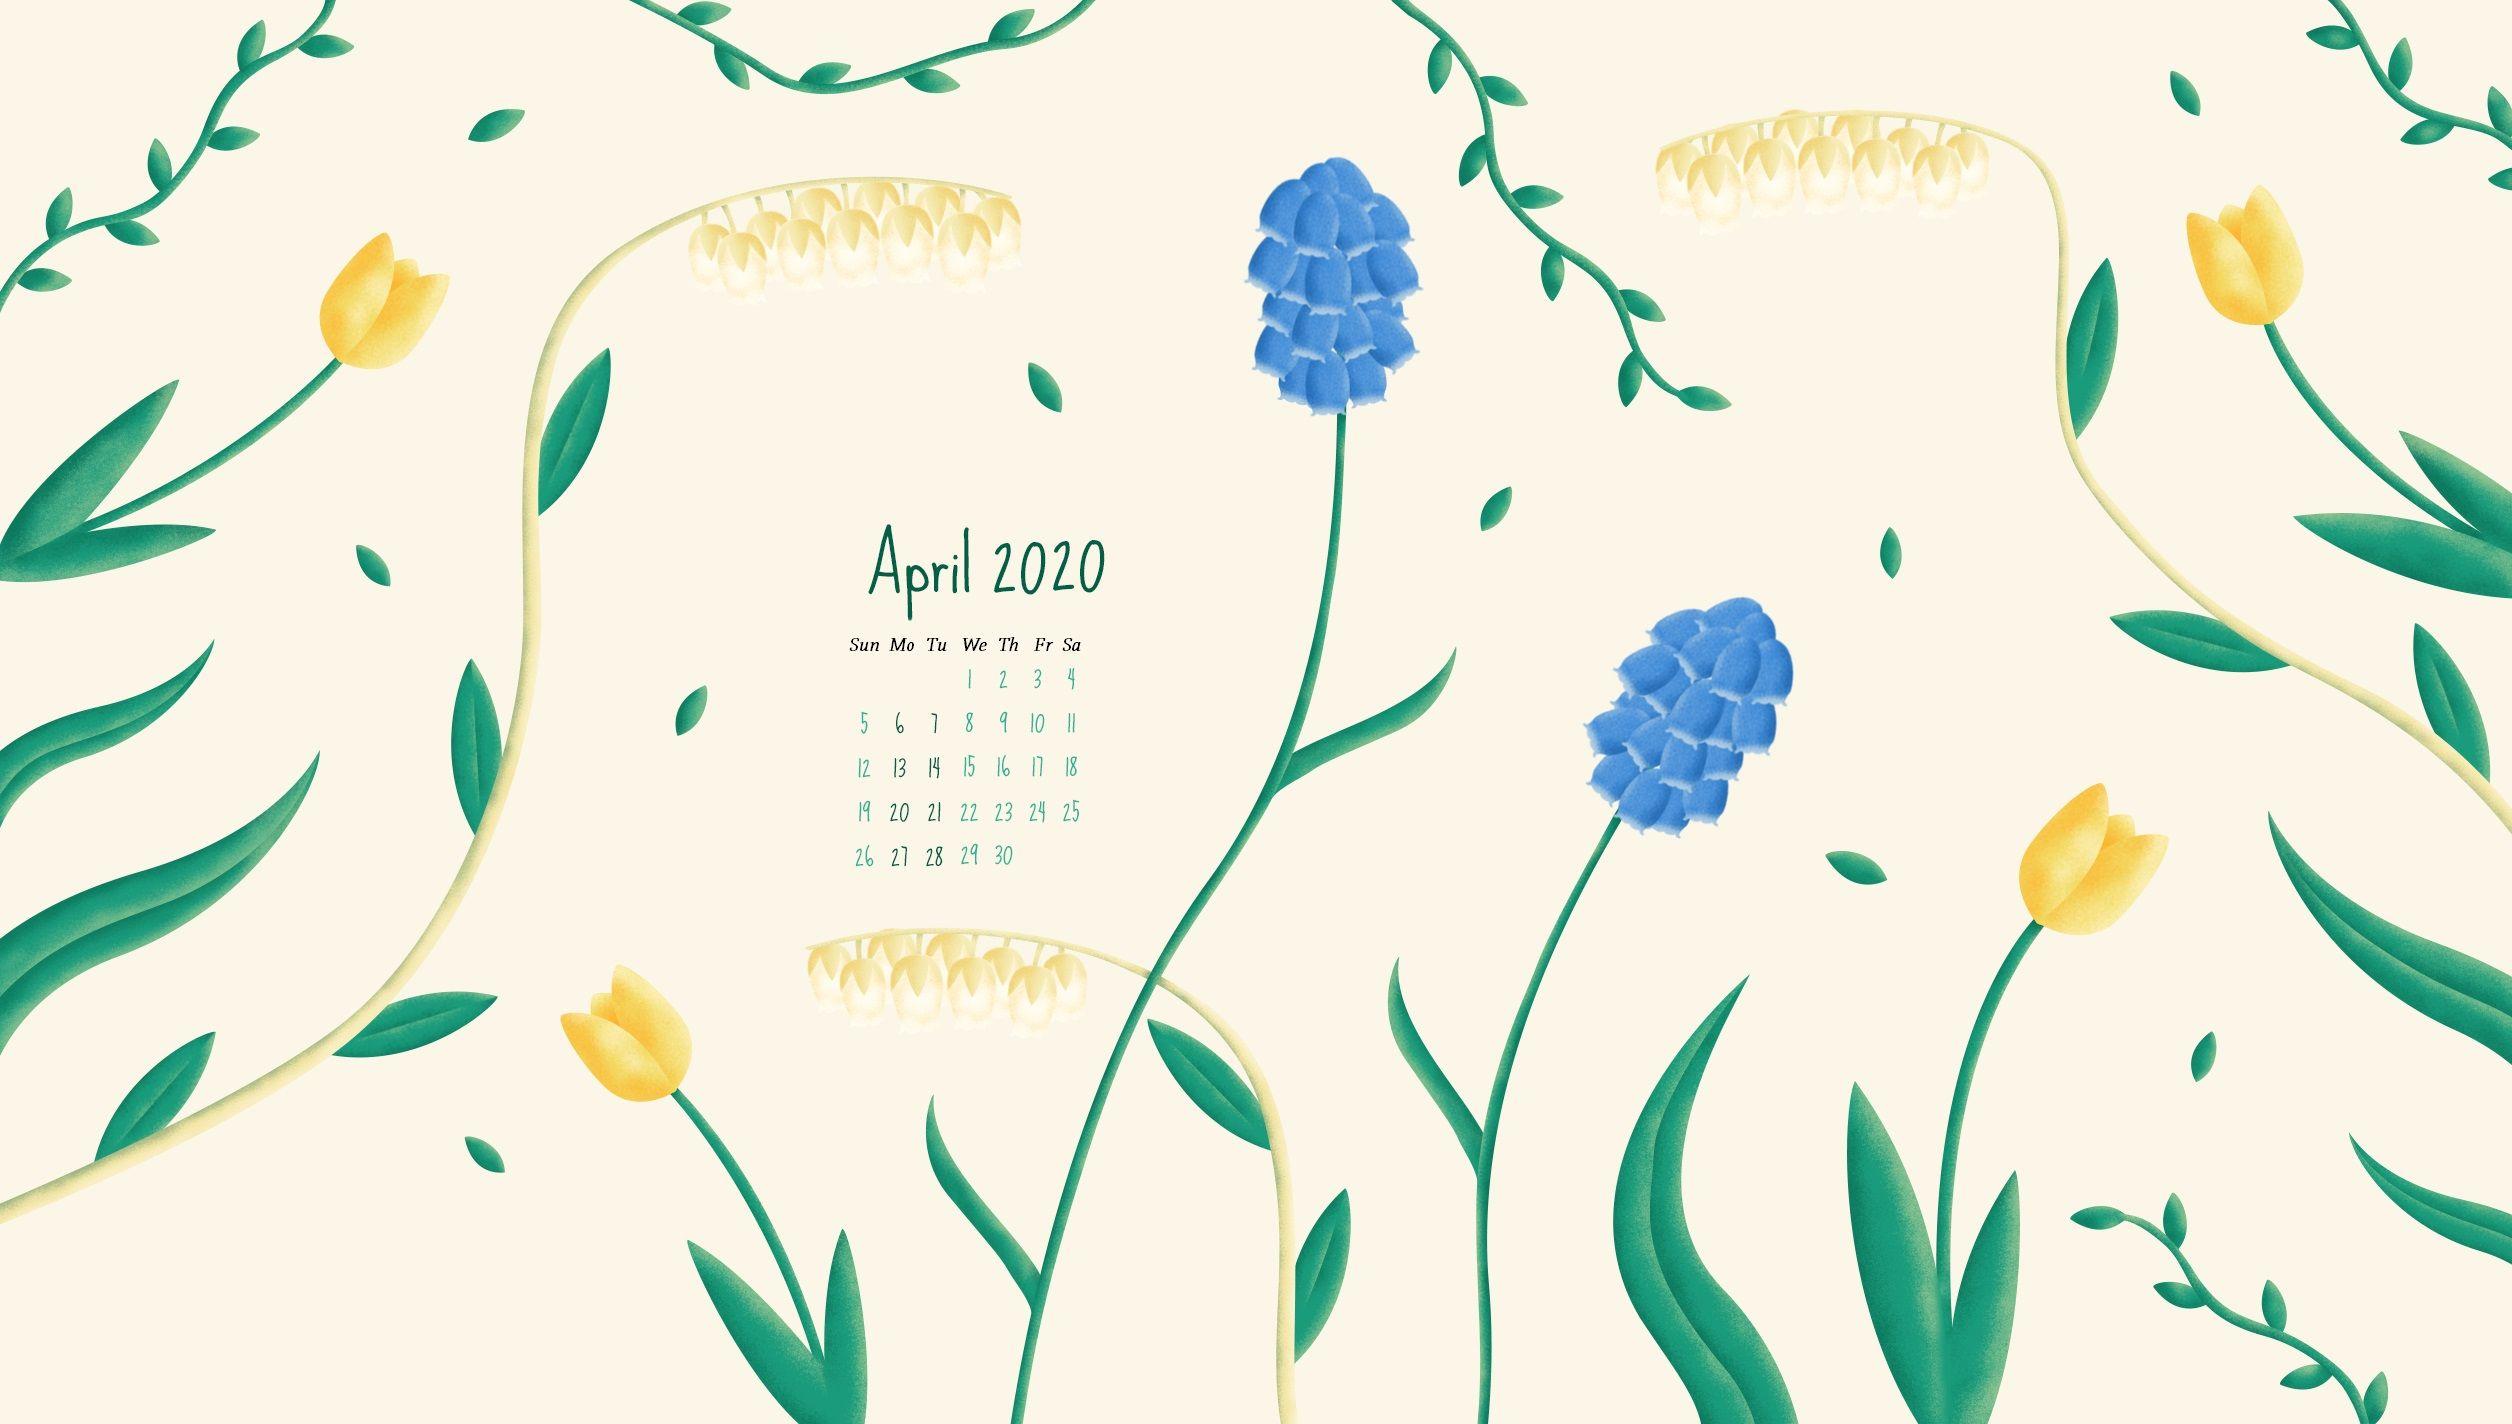 April 2020 Hd Calendar Wallpaper In 2020 Calendar Wallpaper